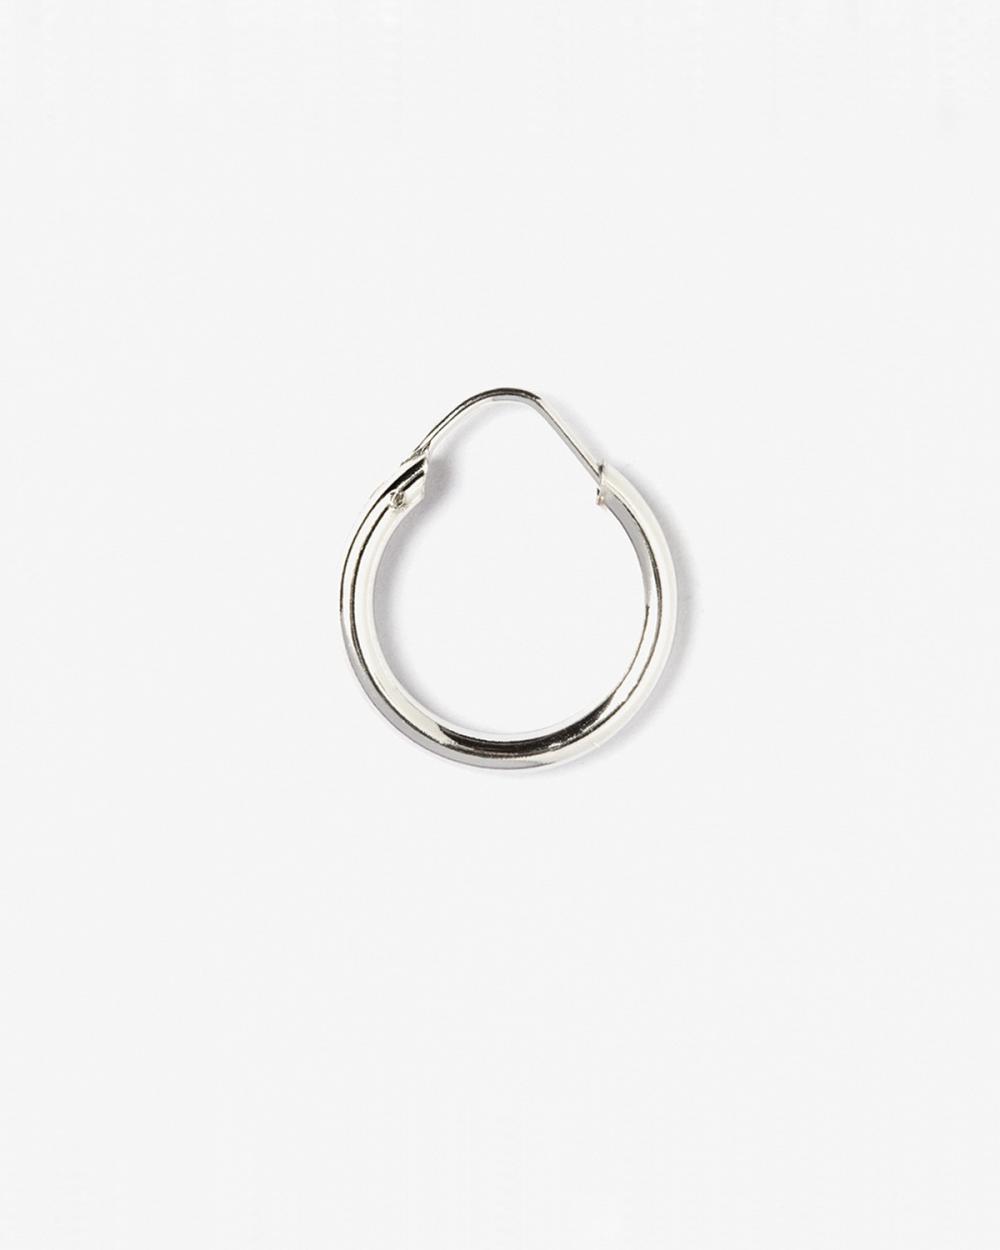 round tube 25 closing pin single hoop earring d15 mm polished rhodium